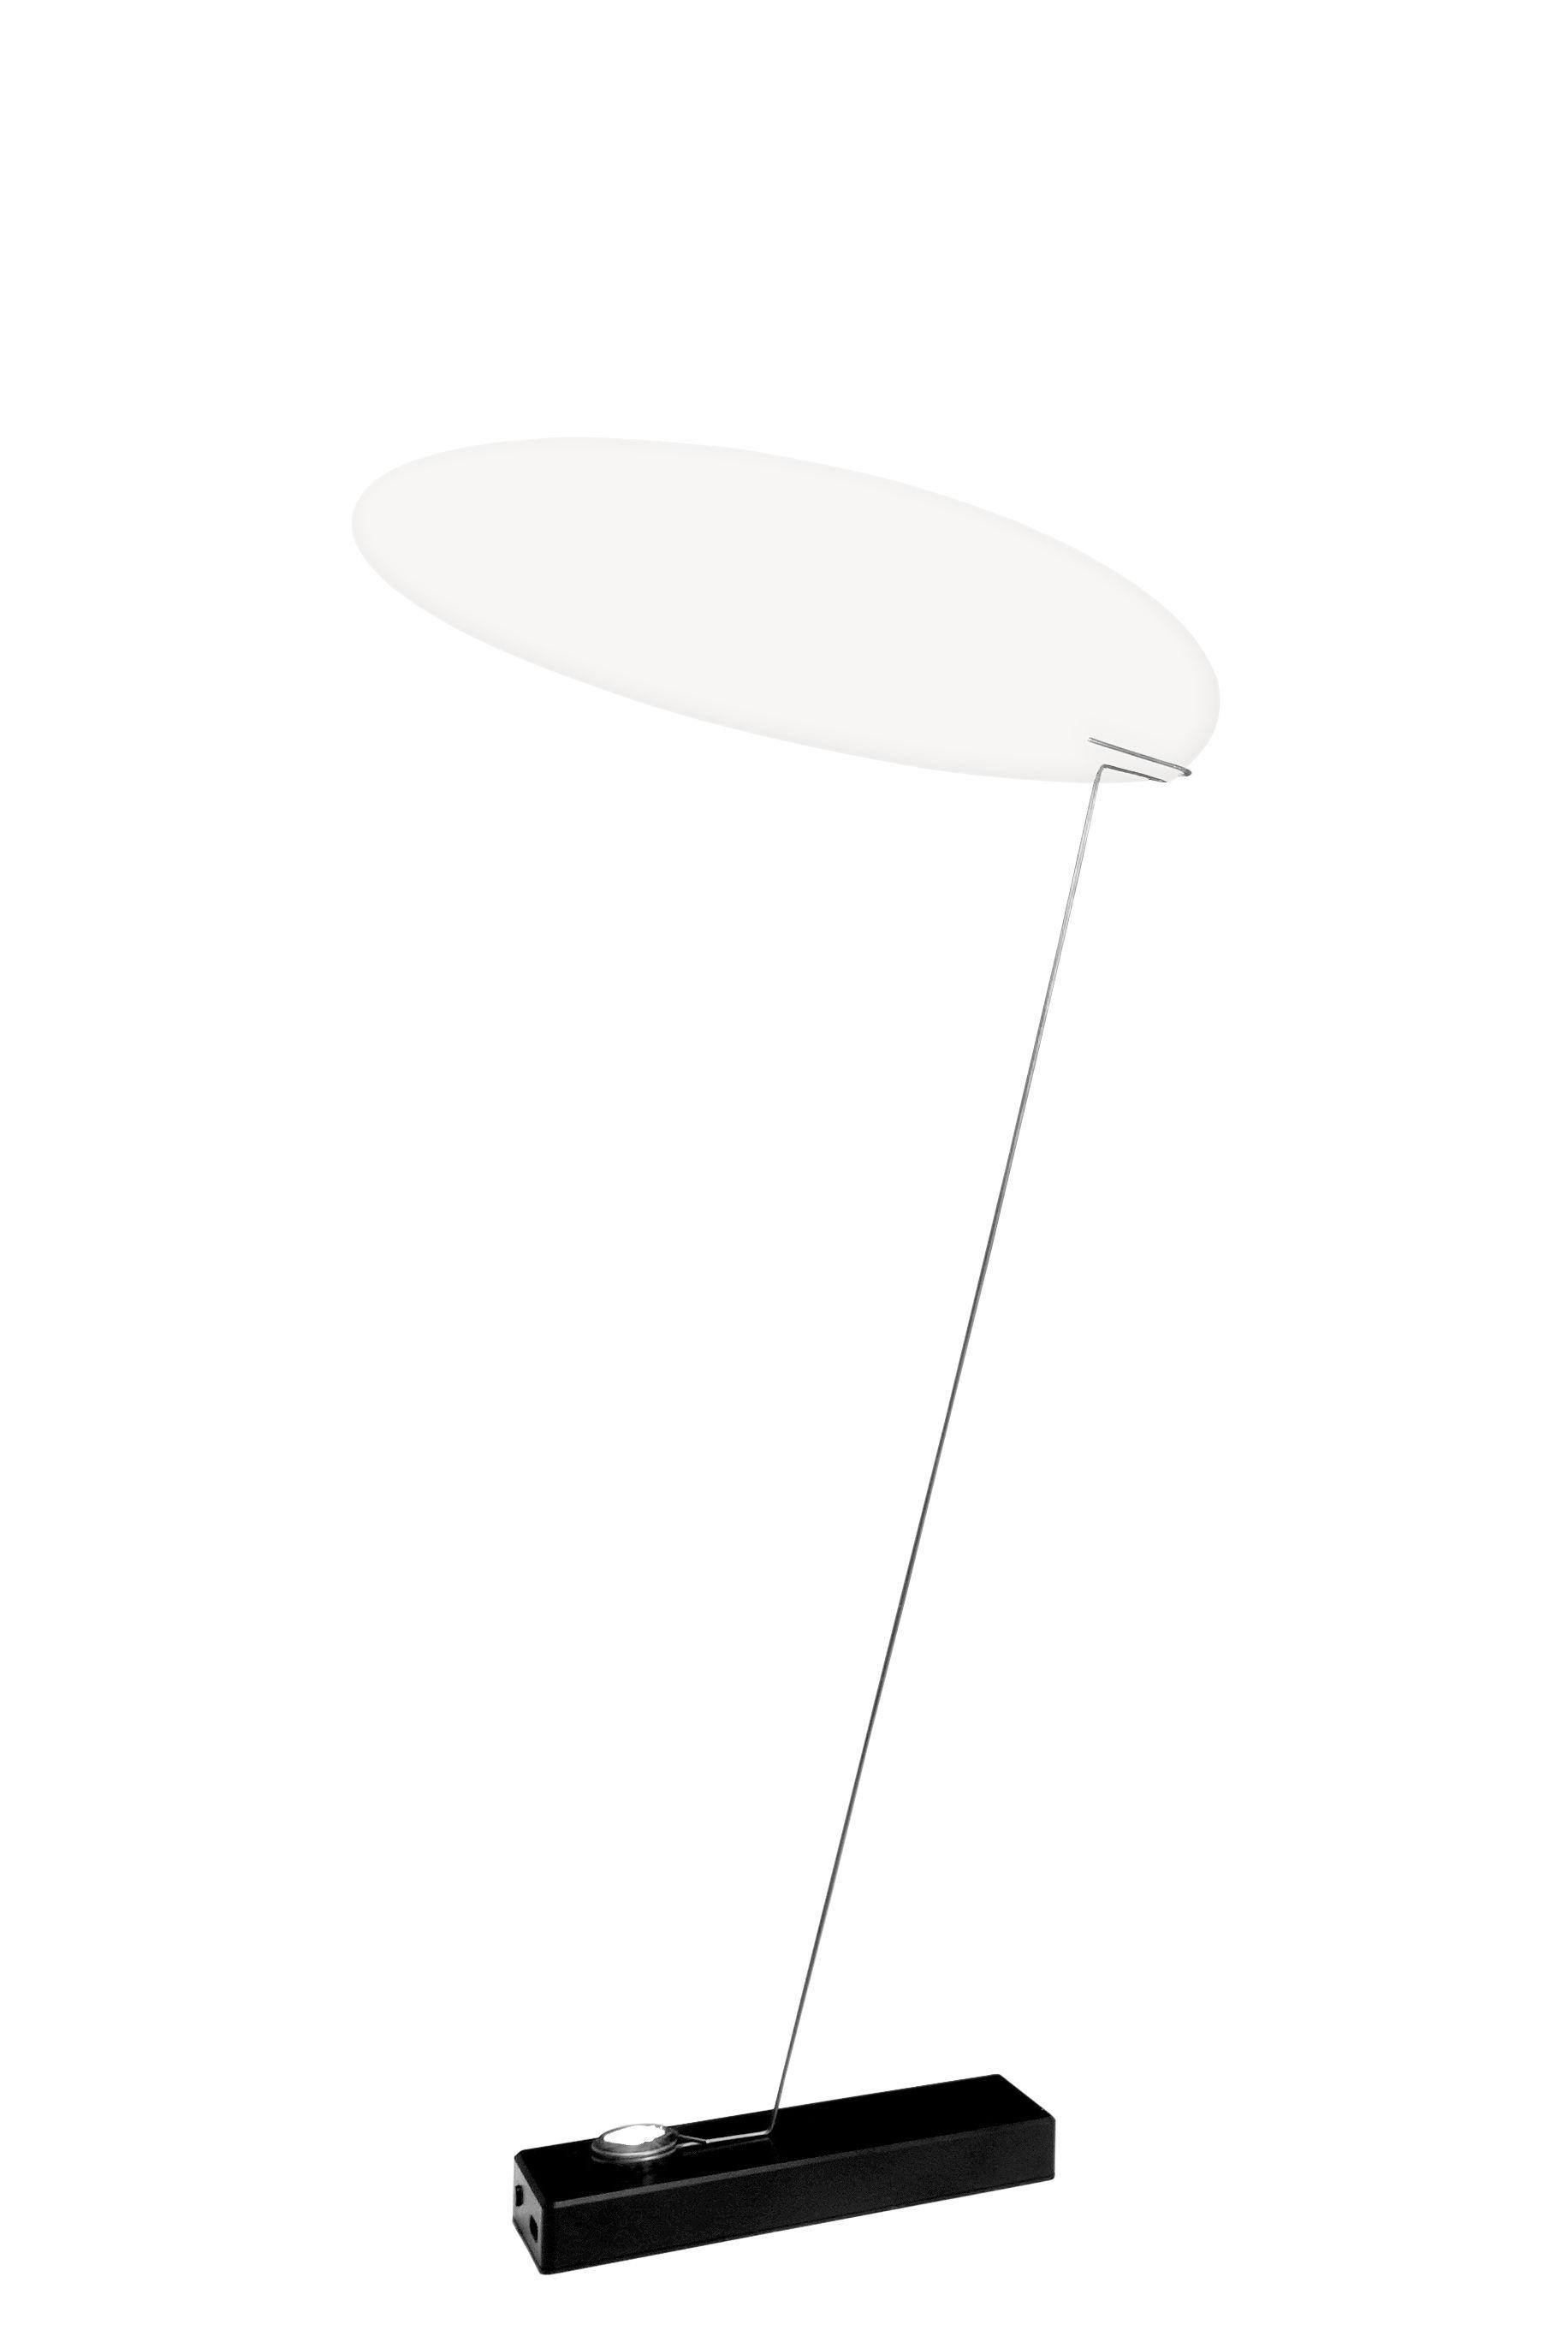 Illuminazione - Lampade da tavolo - Lampada senza fili Koyoo LED - / Carta - Ricarica USB di Ingo Maurer - Bianco / Base nera - alluminio verniciato, Carta, Fil de fer